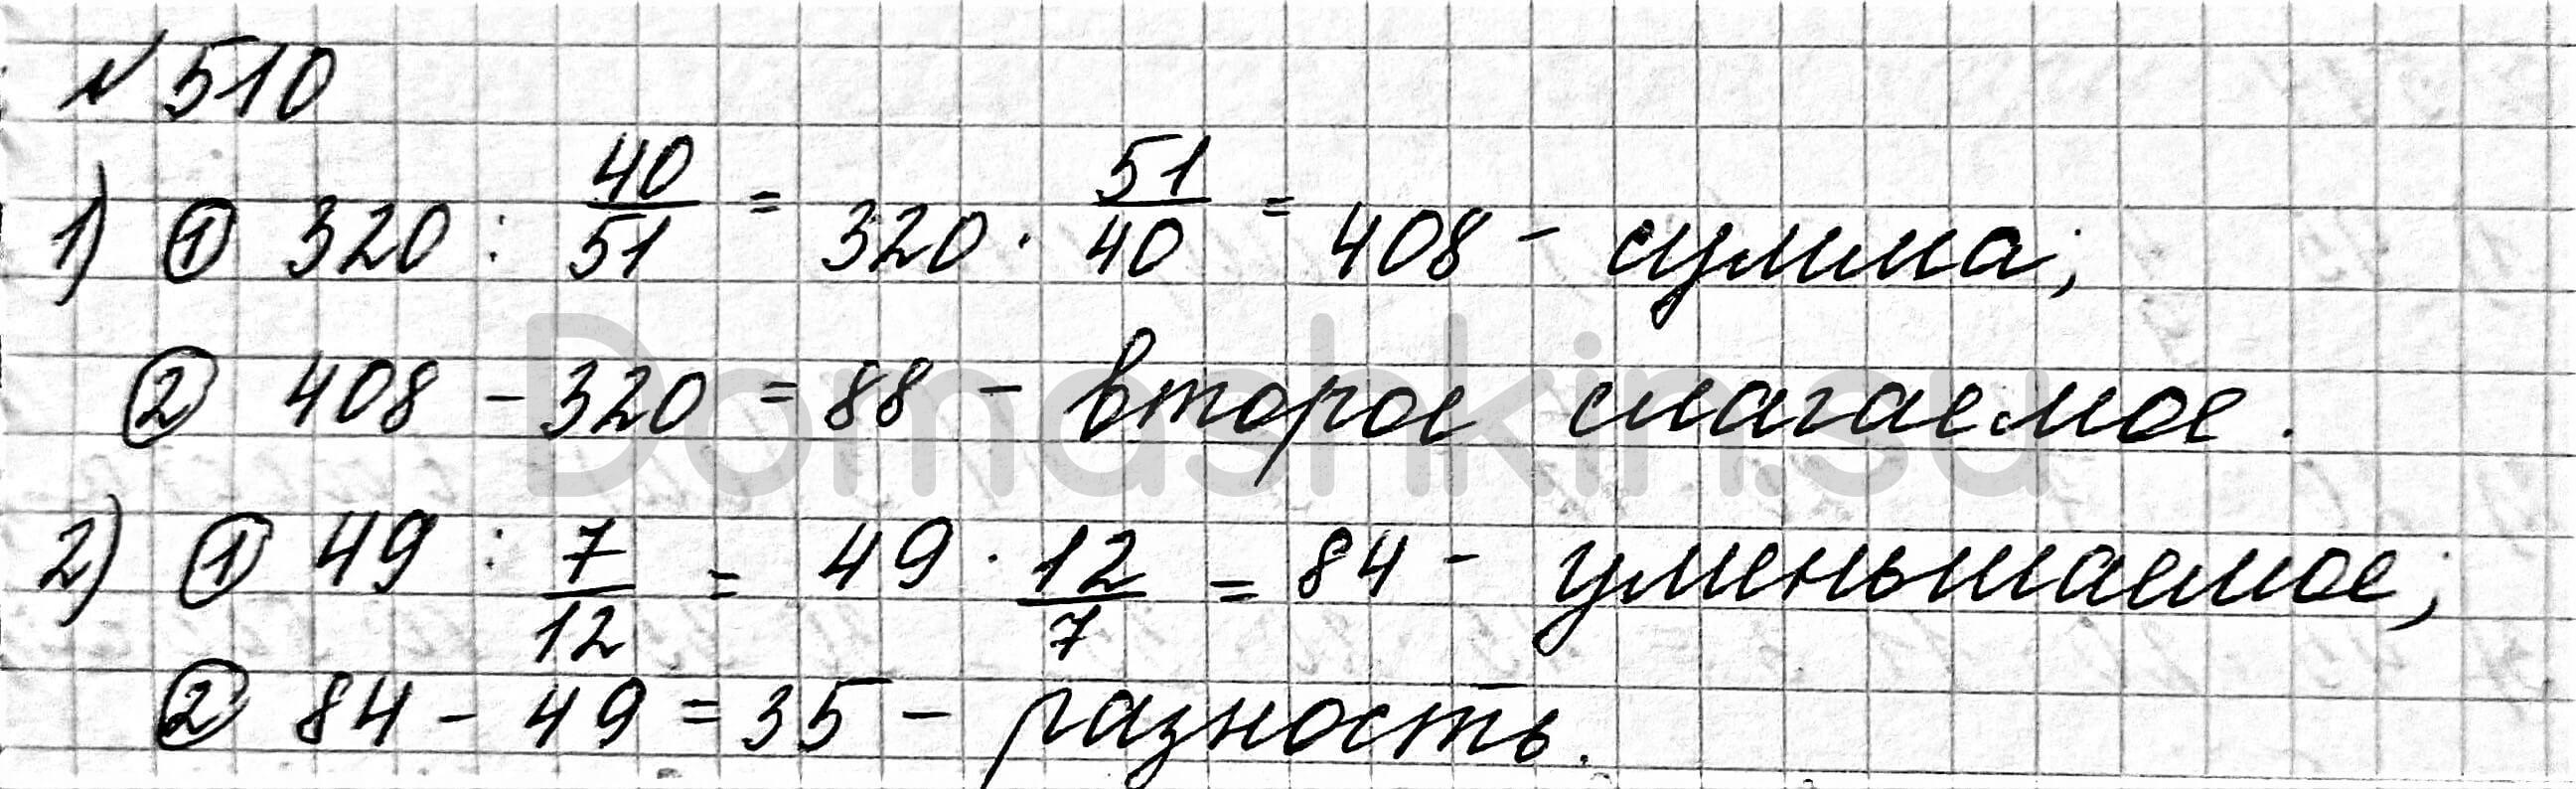 Математика 6 класс учебник Мерзляк номер 510 решение